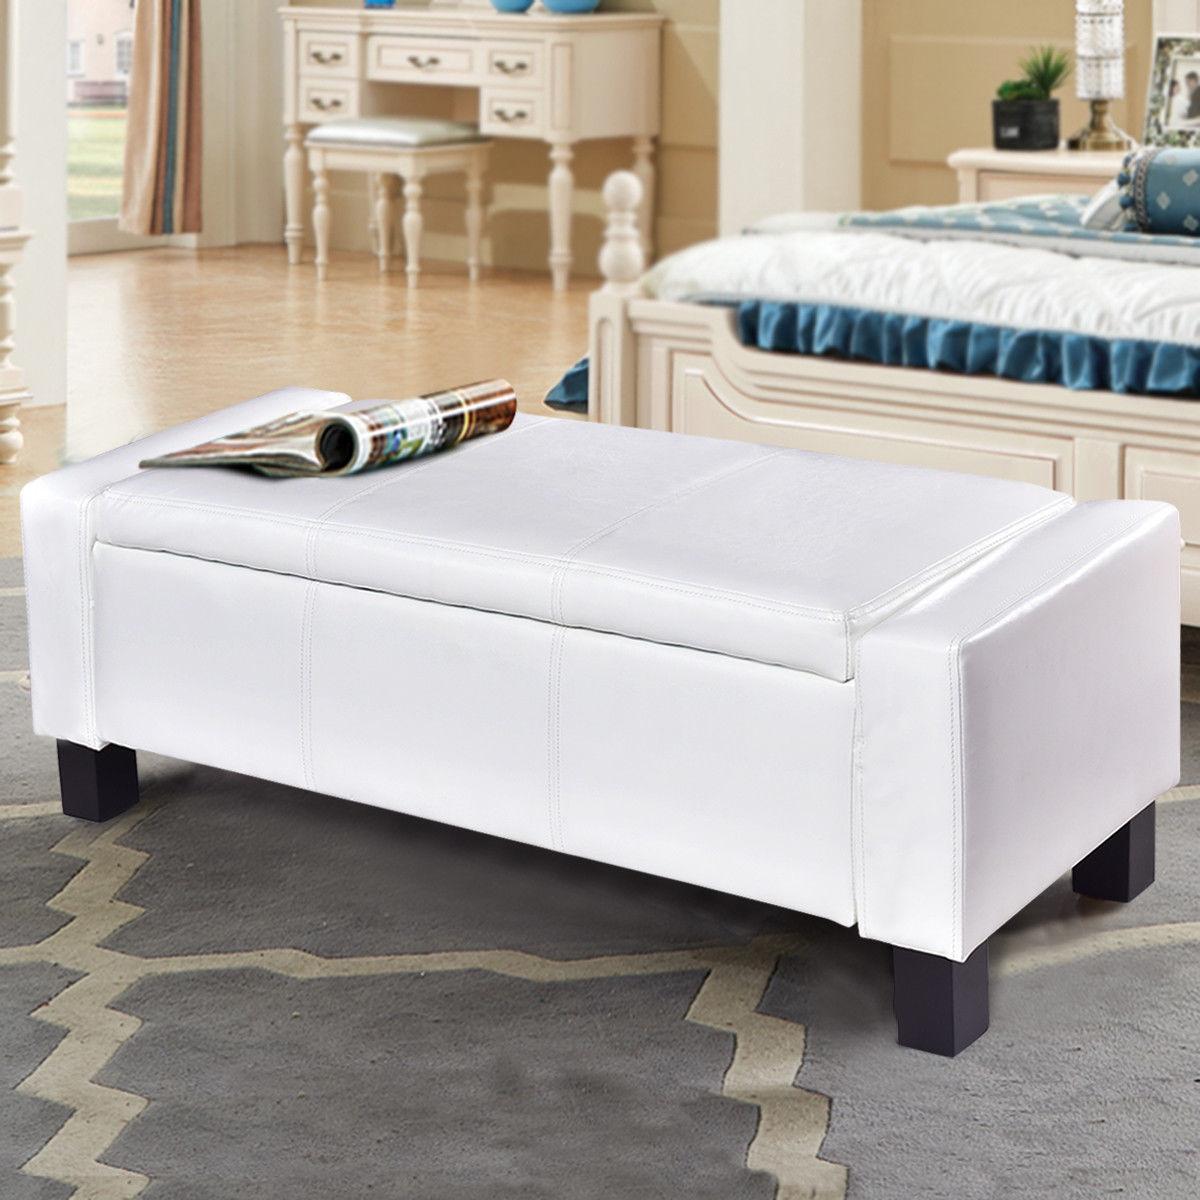 Giantex 43 Pu Leather Ottoman Bed Storage Bench Modern